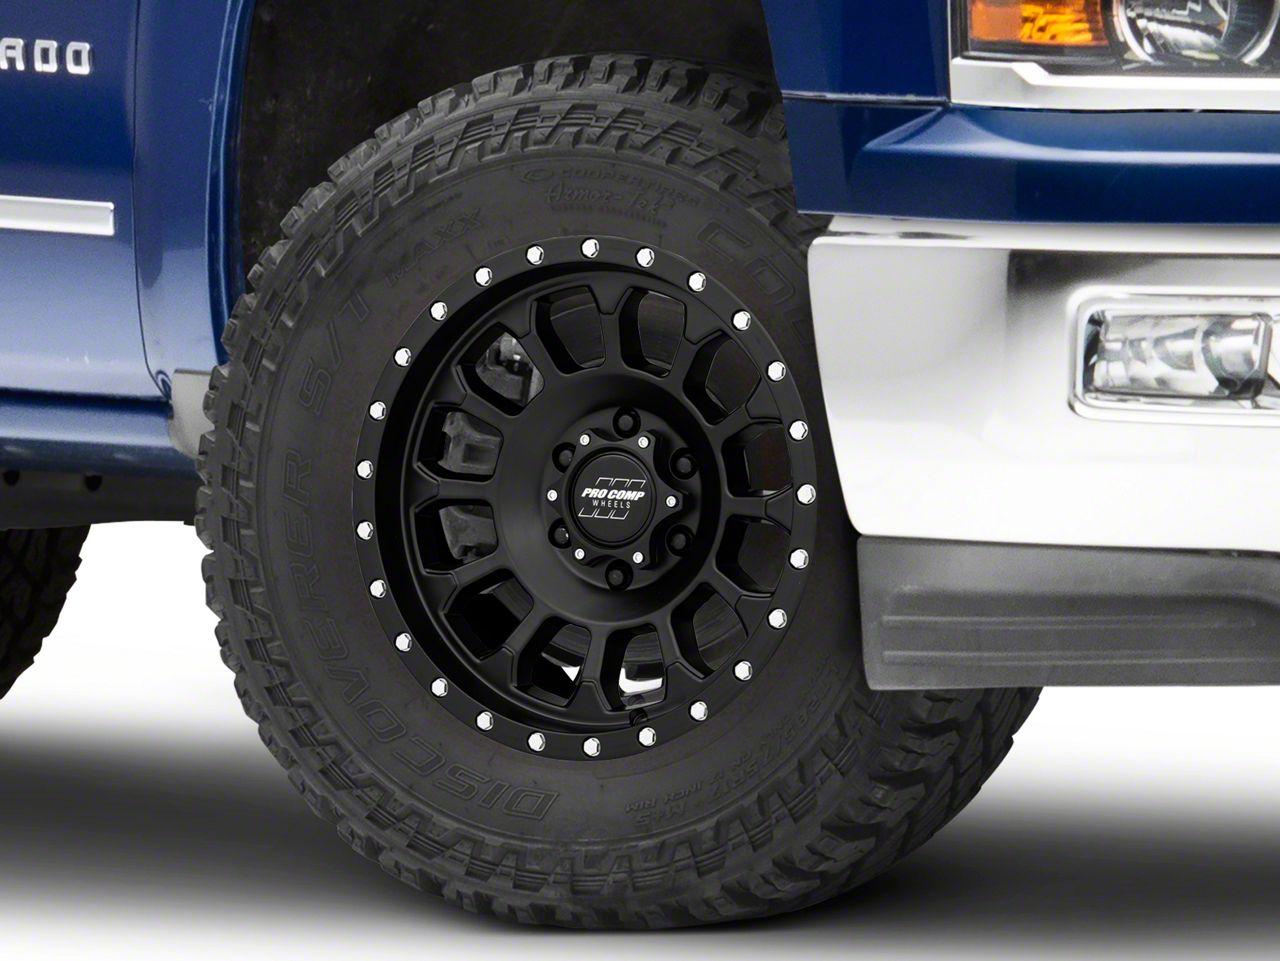 Pro Comp Rockwell Satin Black 6-Lug Wheel - 18x9 (99-18 Silverado 1500)